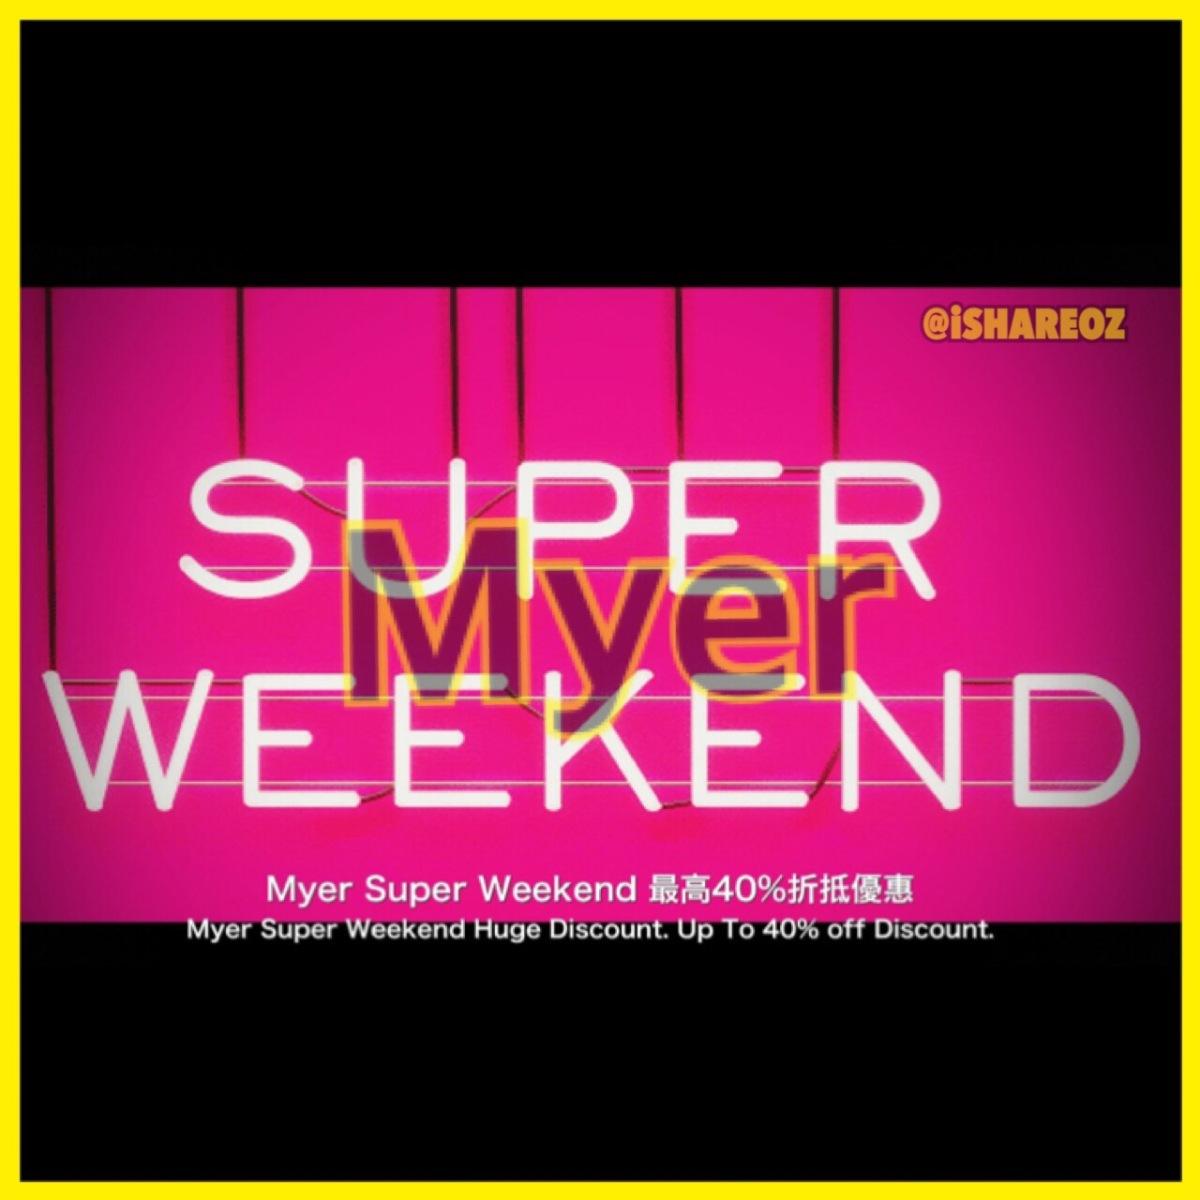 bff132b598 #BigSale Myer Super Weekend 全澳瘋狂瘋搶購物掃街,Online商城及實體百貨商圈最高享有40%OFF… – iSHARE  #OZ 愛炫澳洲